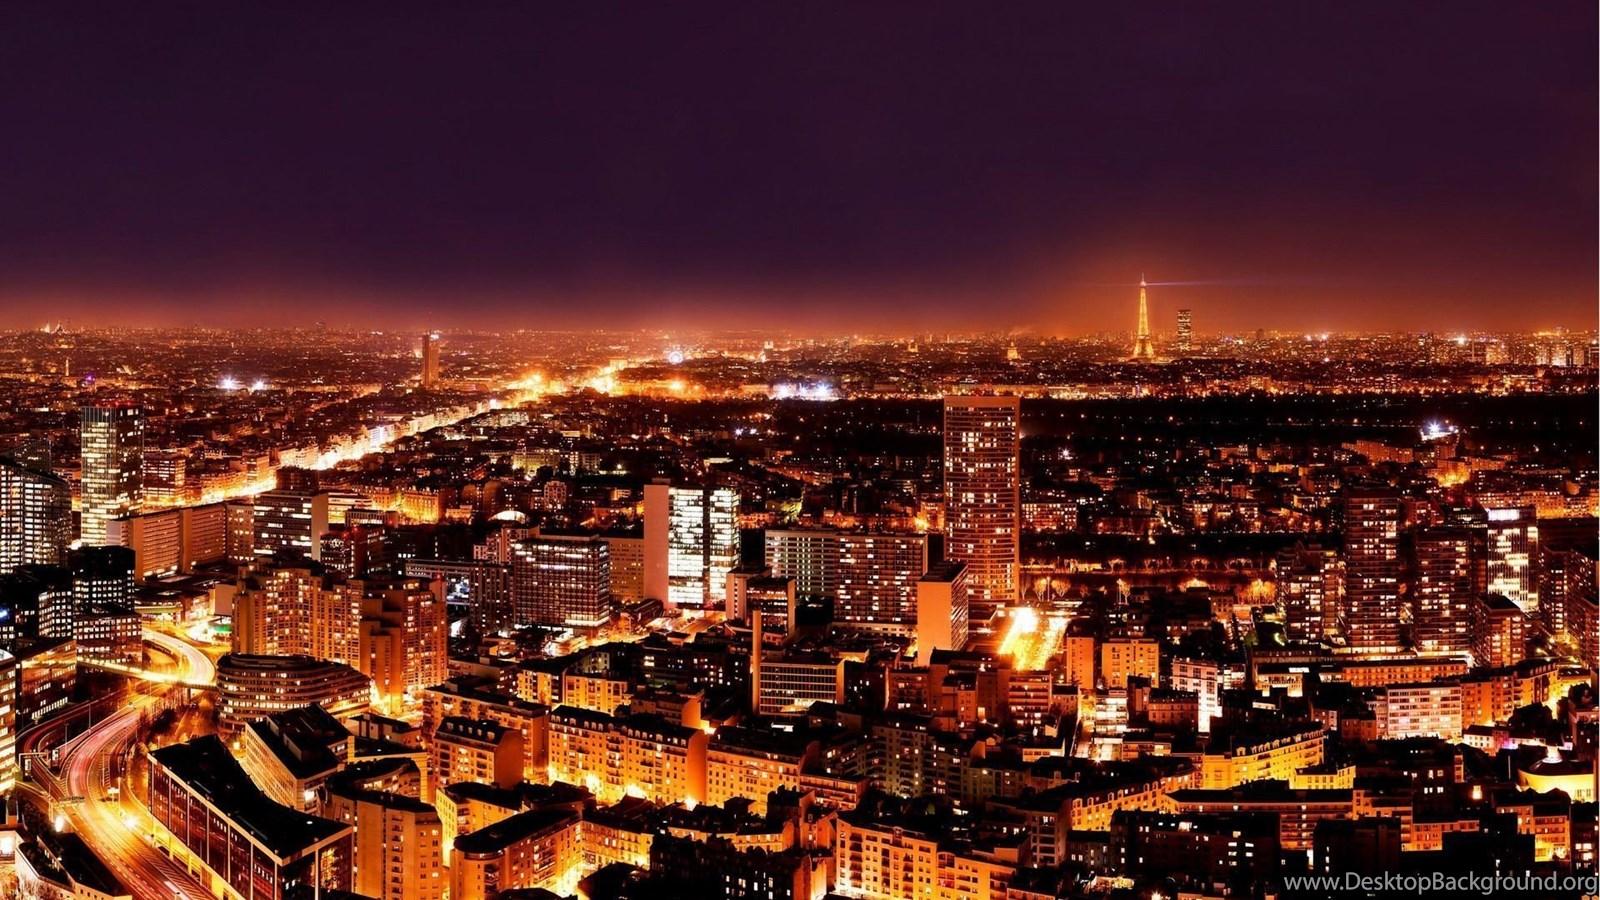 Hd Quality Beautiful Paris Night Wallpapers Hd 8 Siwallpapers 8531 Desktop Background